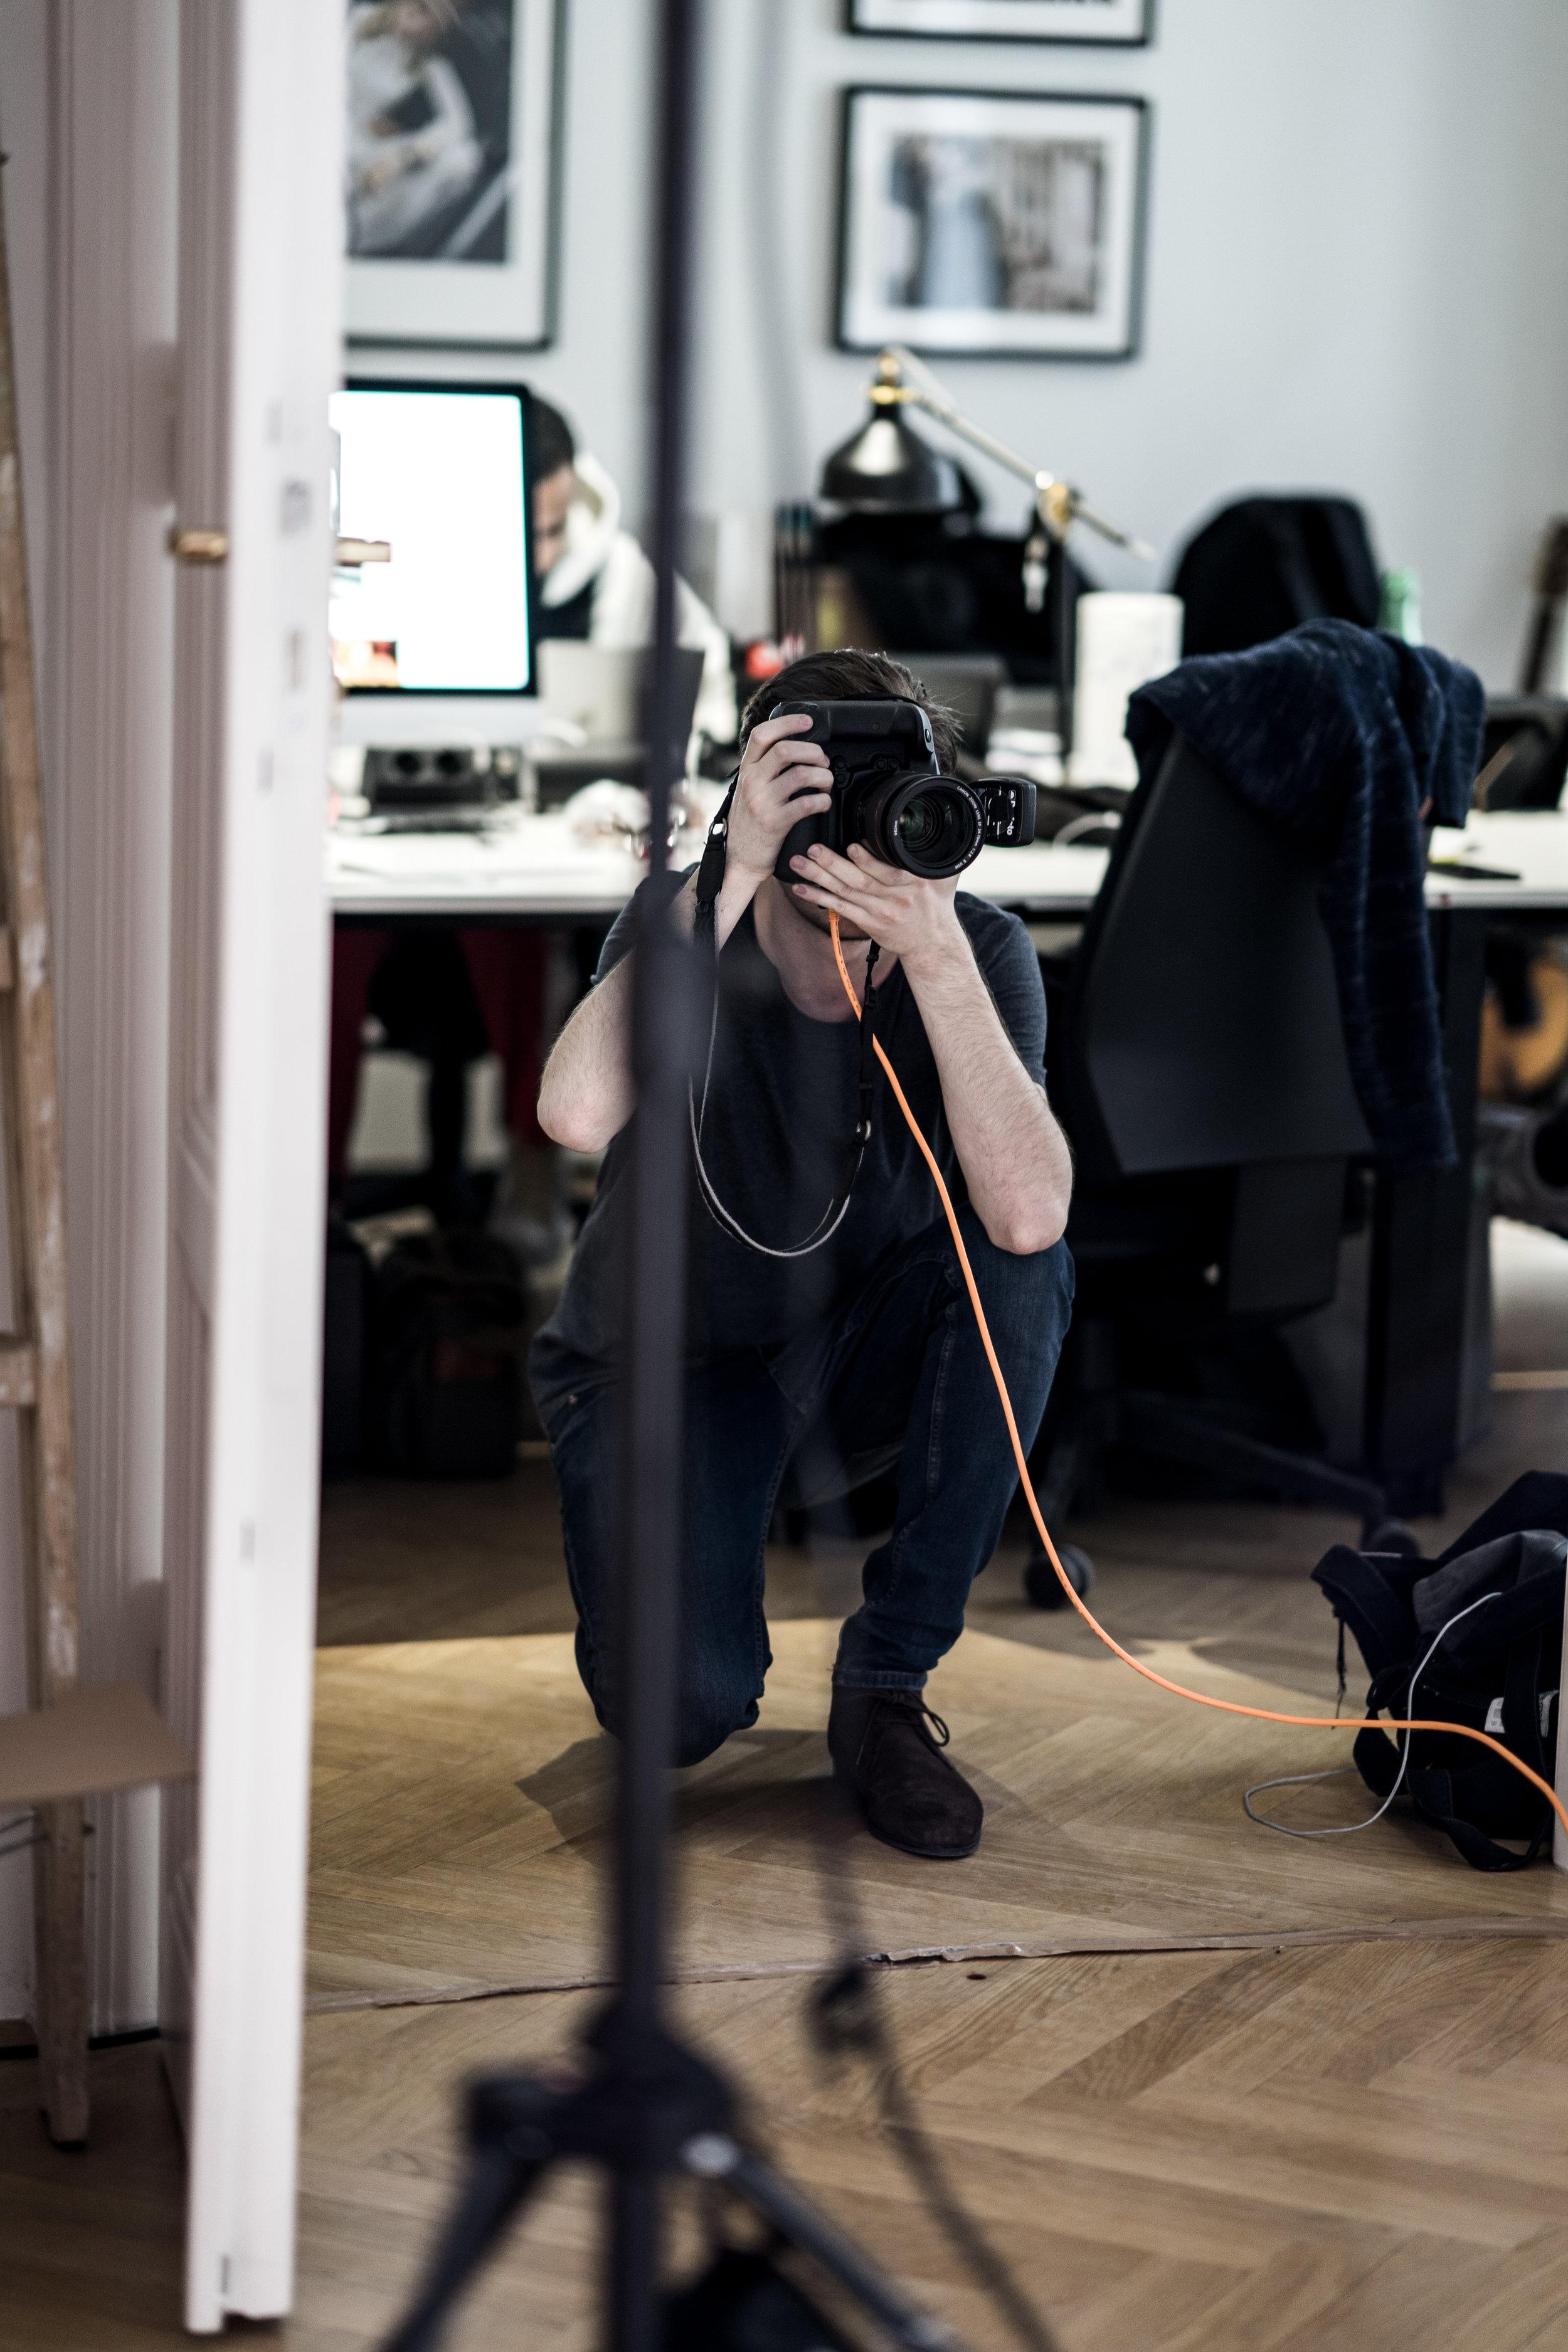 fotoshooting-wien-Adriana-Patsalou-kreativagentur-constant-evolution.jpg